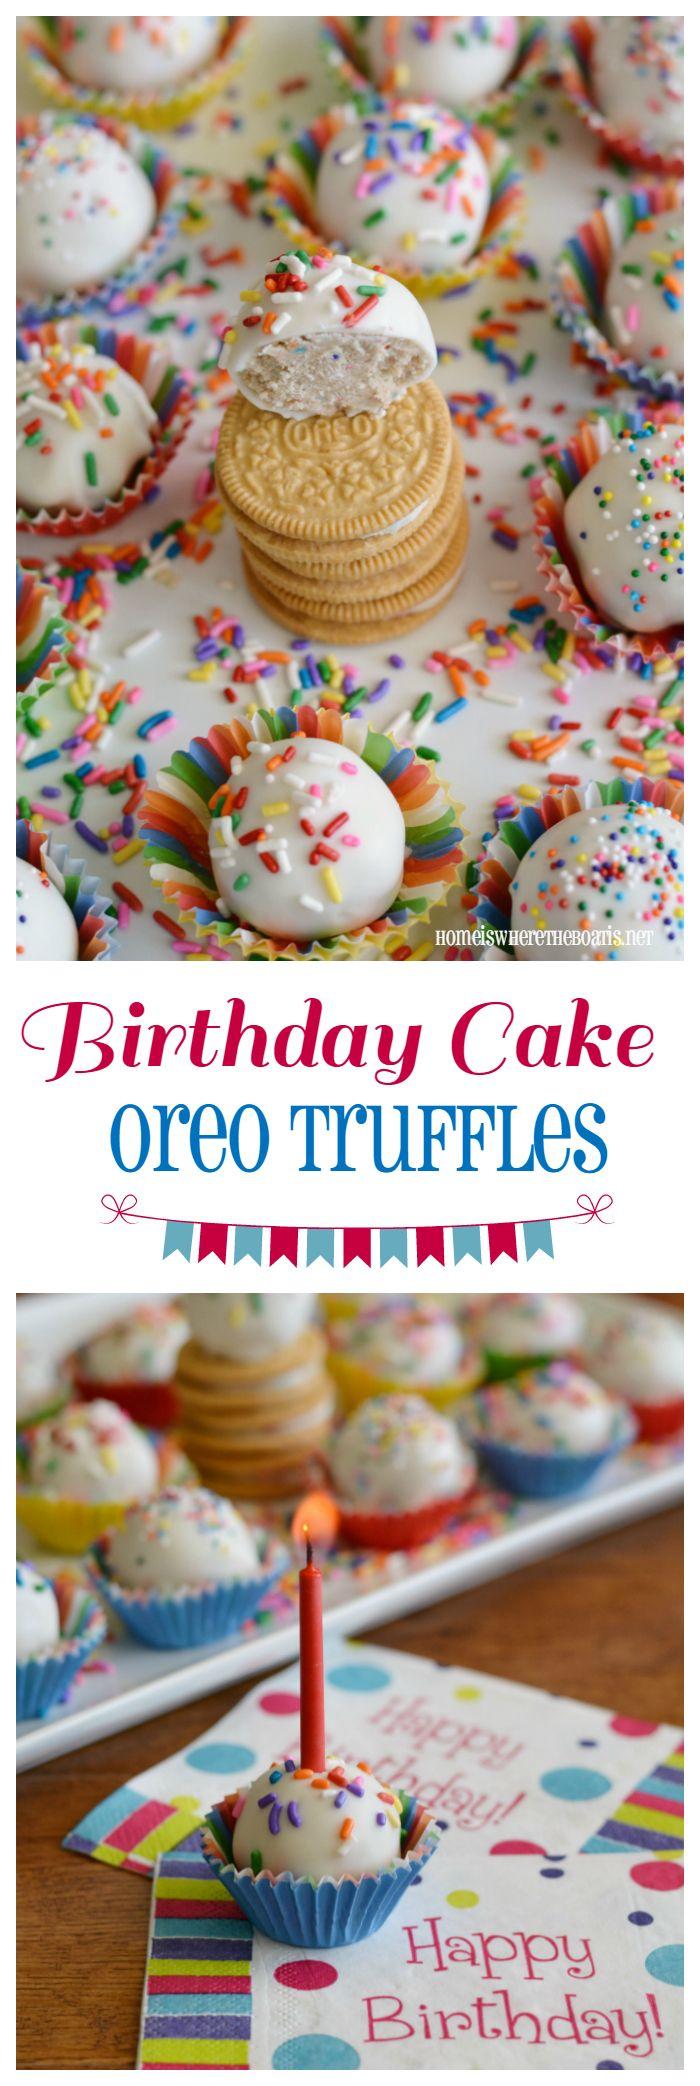 Birthday Cake Oreo Truffles! No-bake treats that are a piece of cake ...